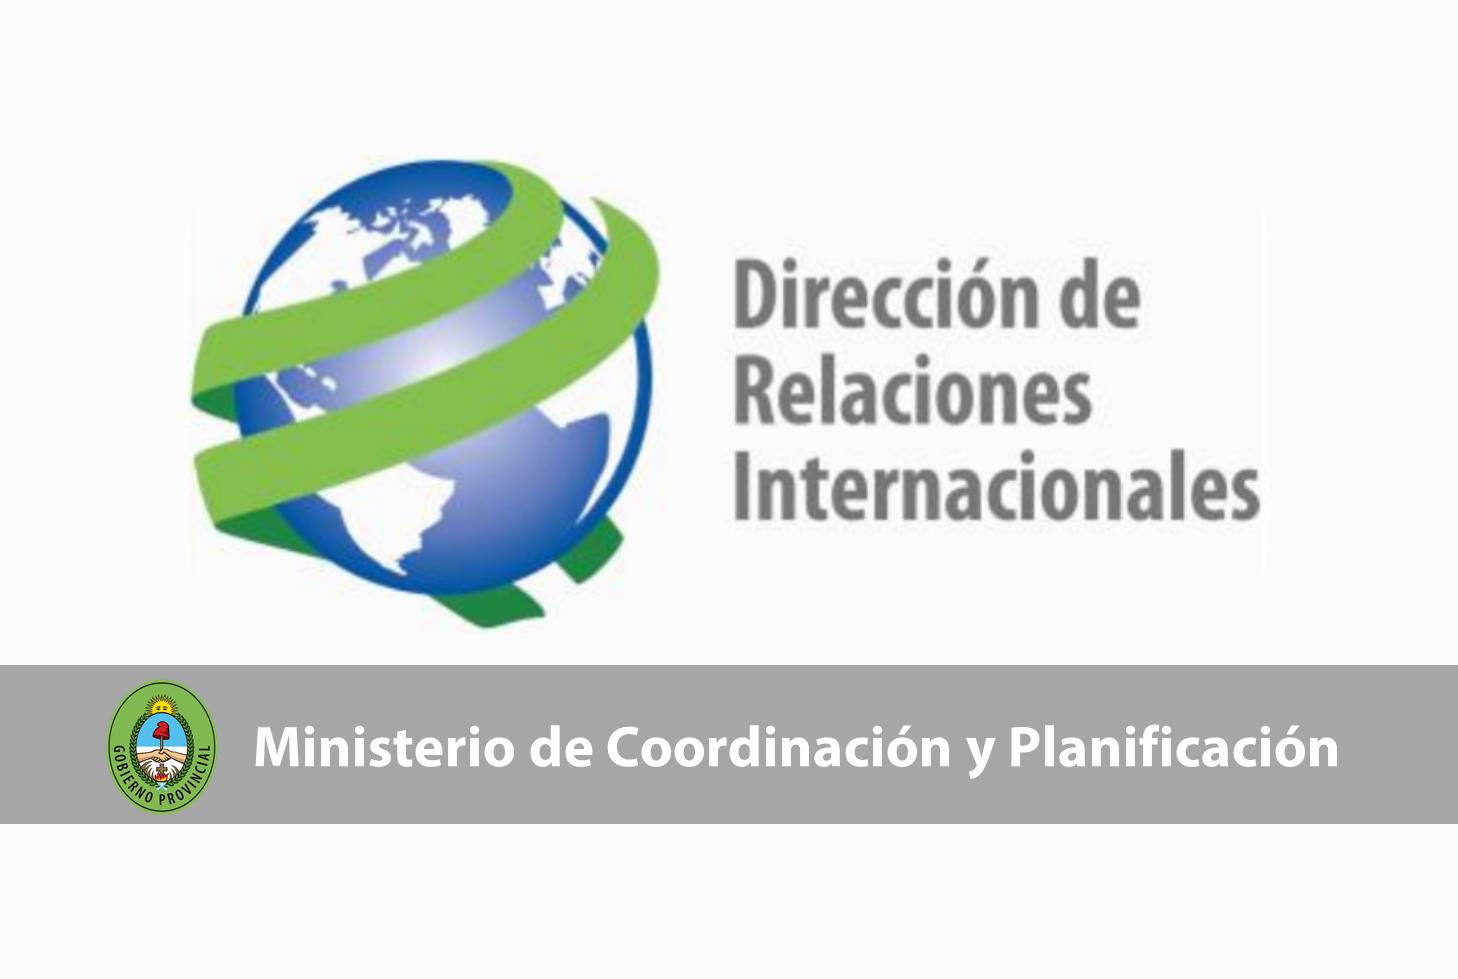 Fundaciòn Prìncipe Claus: Convocatoria primeros auxilios al patrimonio documental amenazado